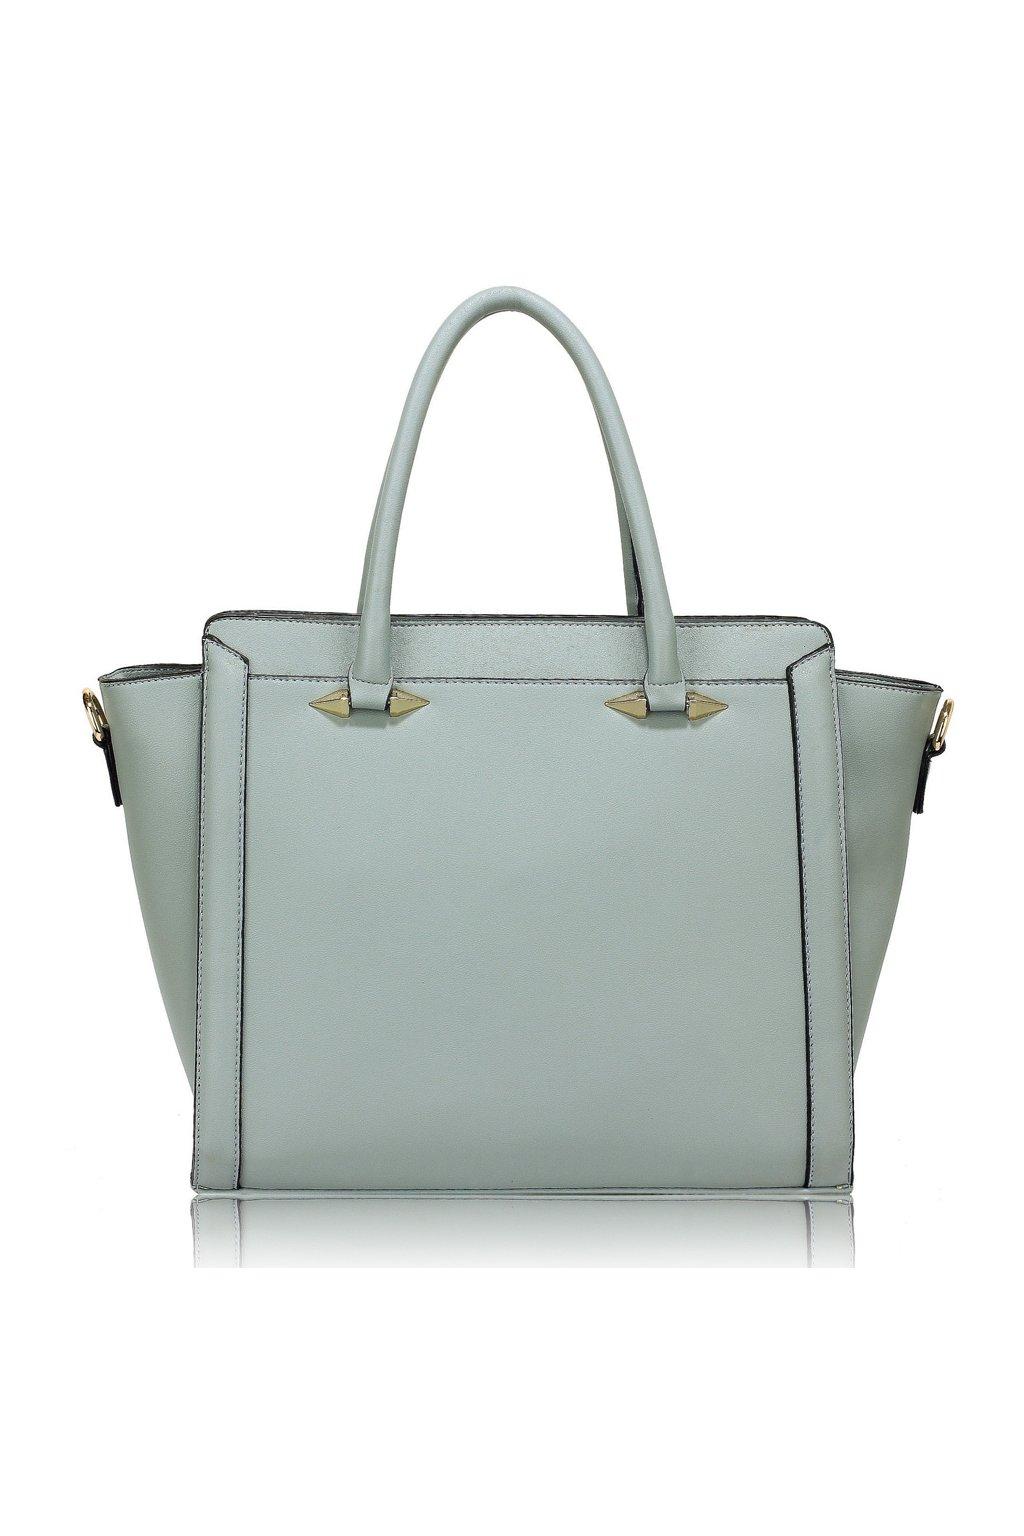 Trendy kabelka do ruky Anastasia modrá AG00516